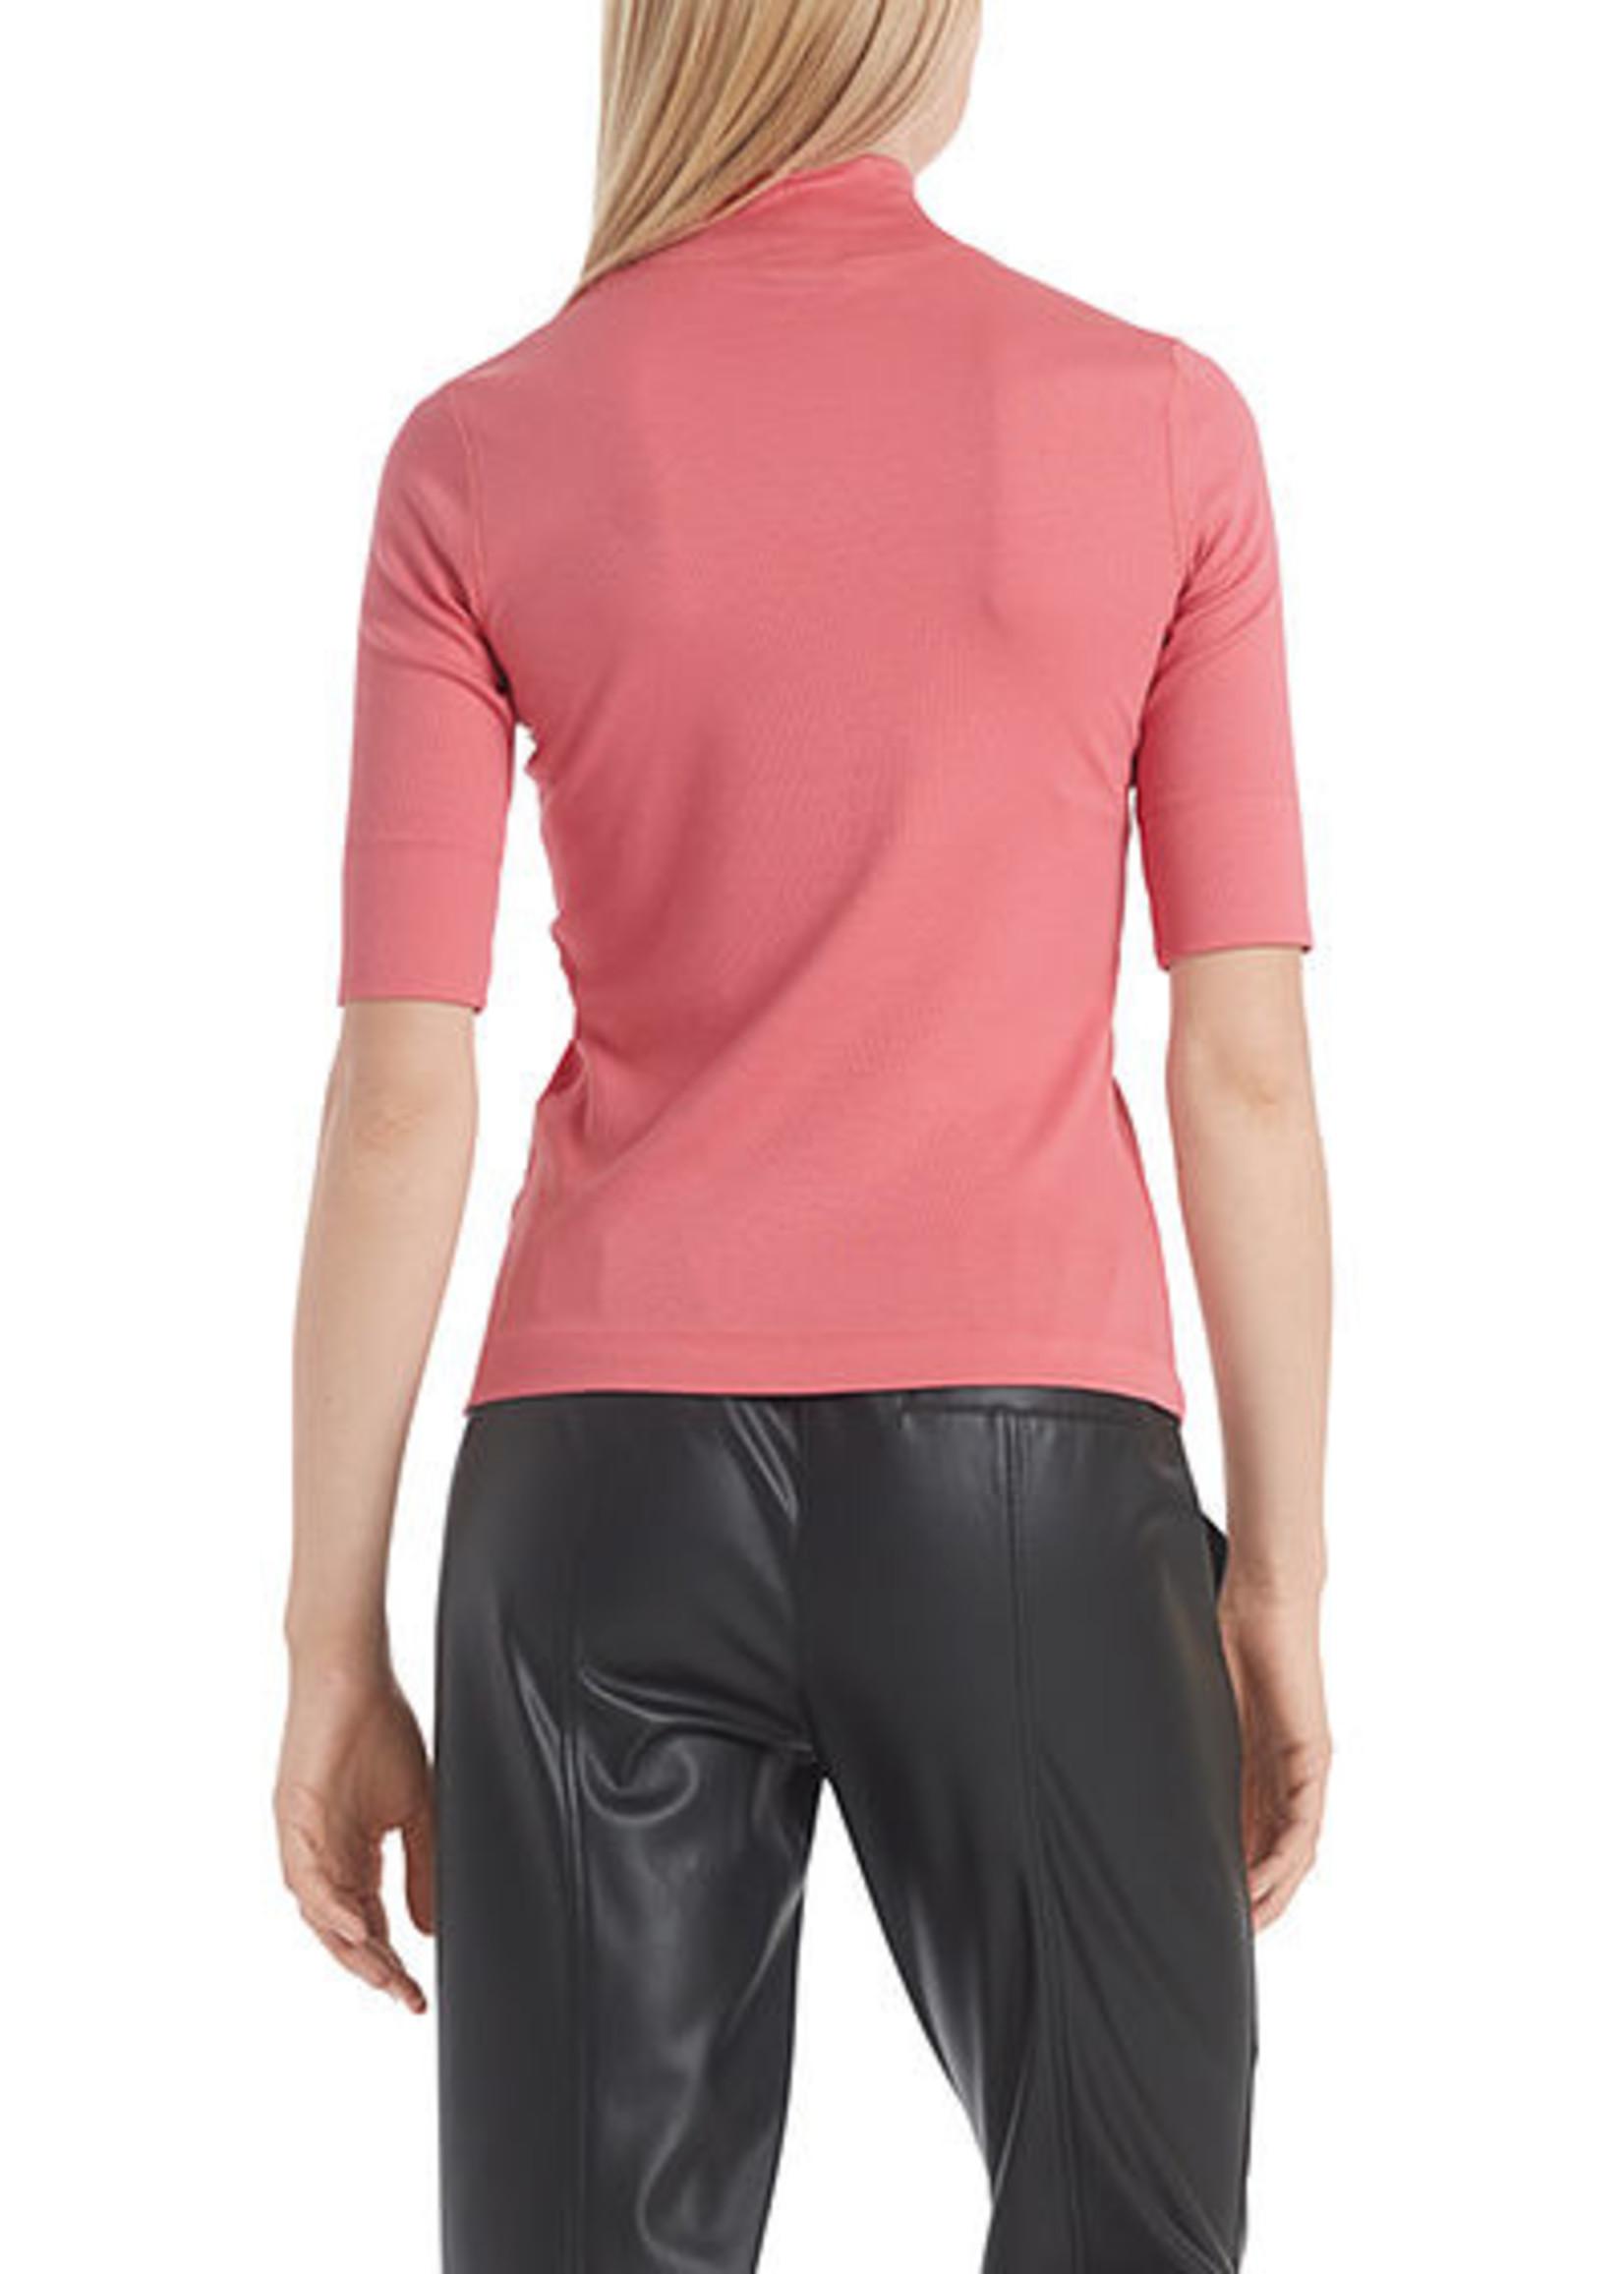 Marccain Sports T-shirt RS 48.04 J50 sugar coral